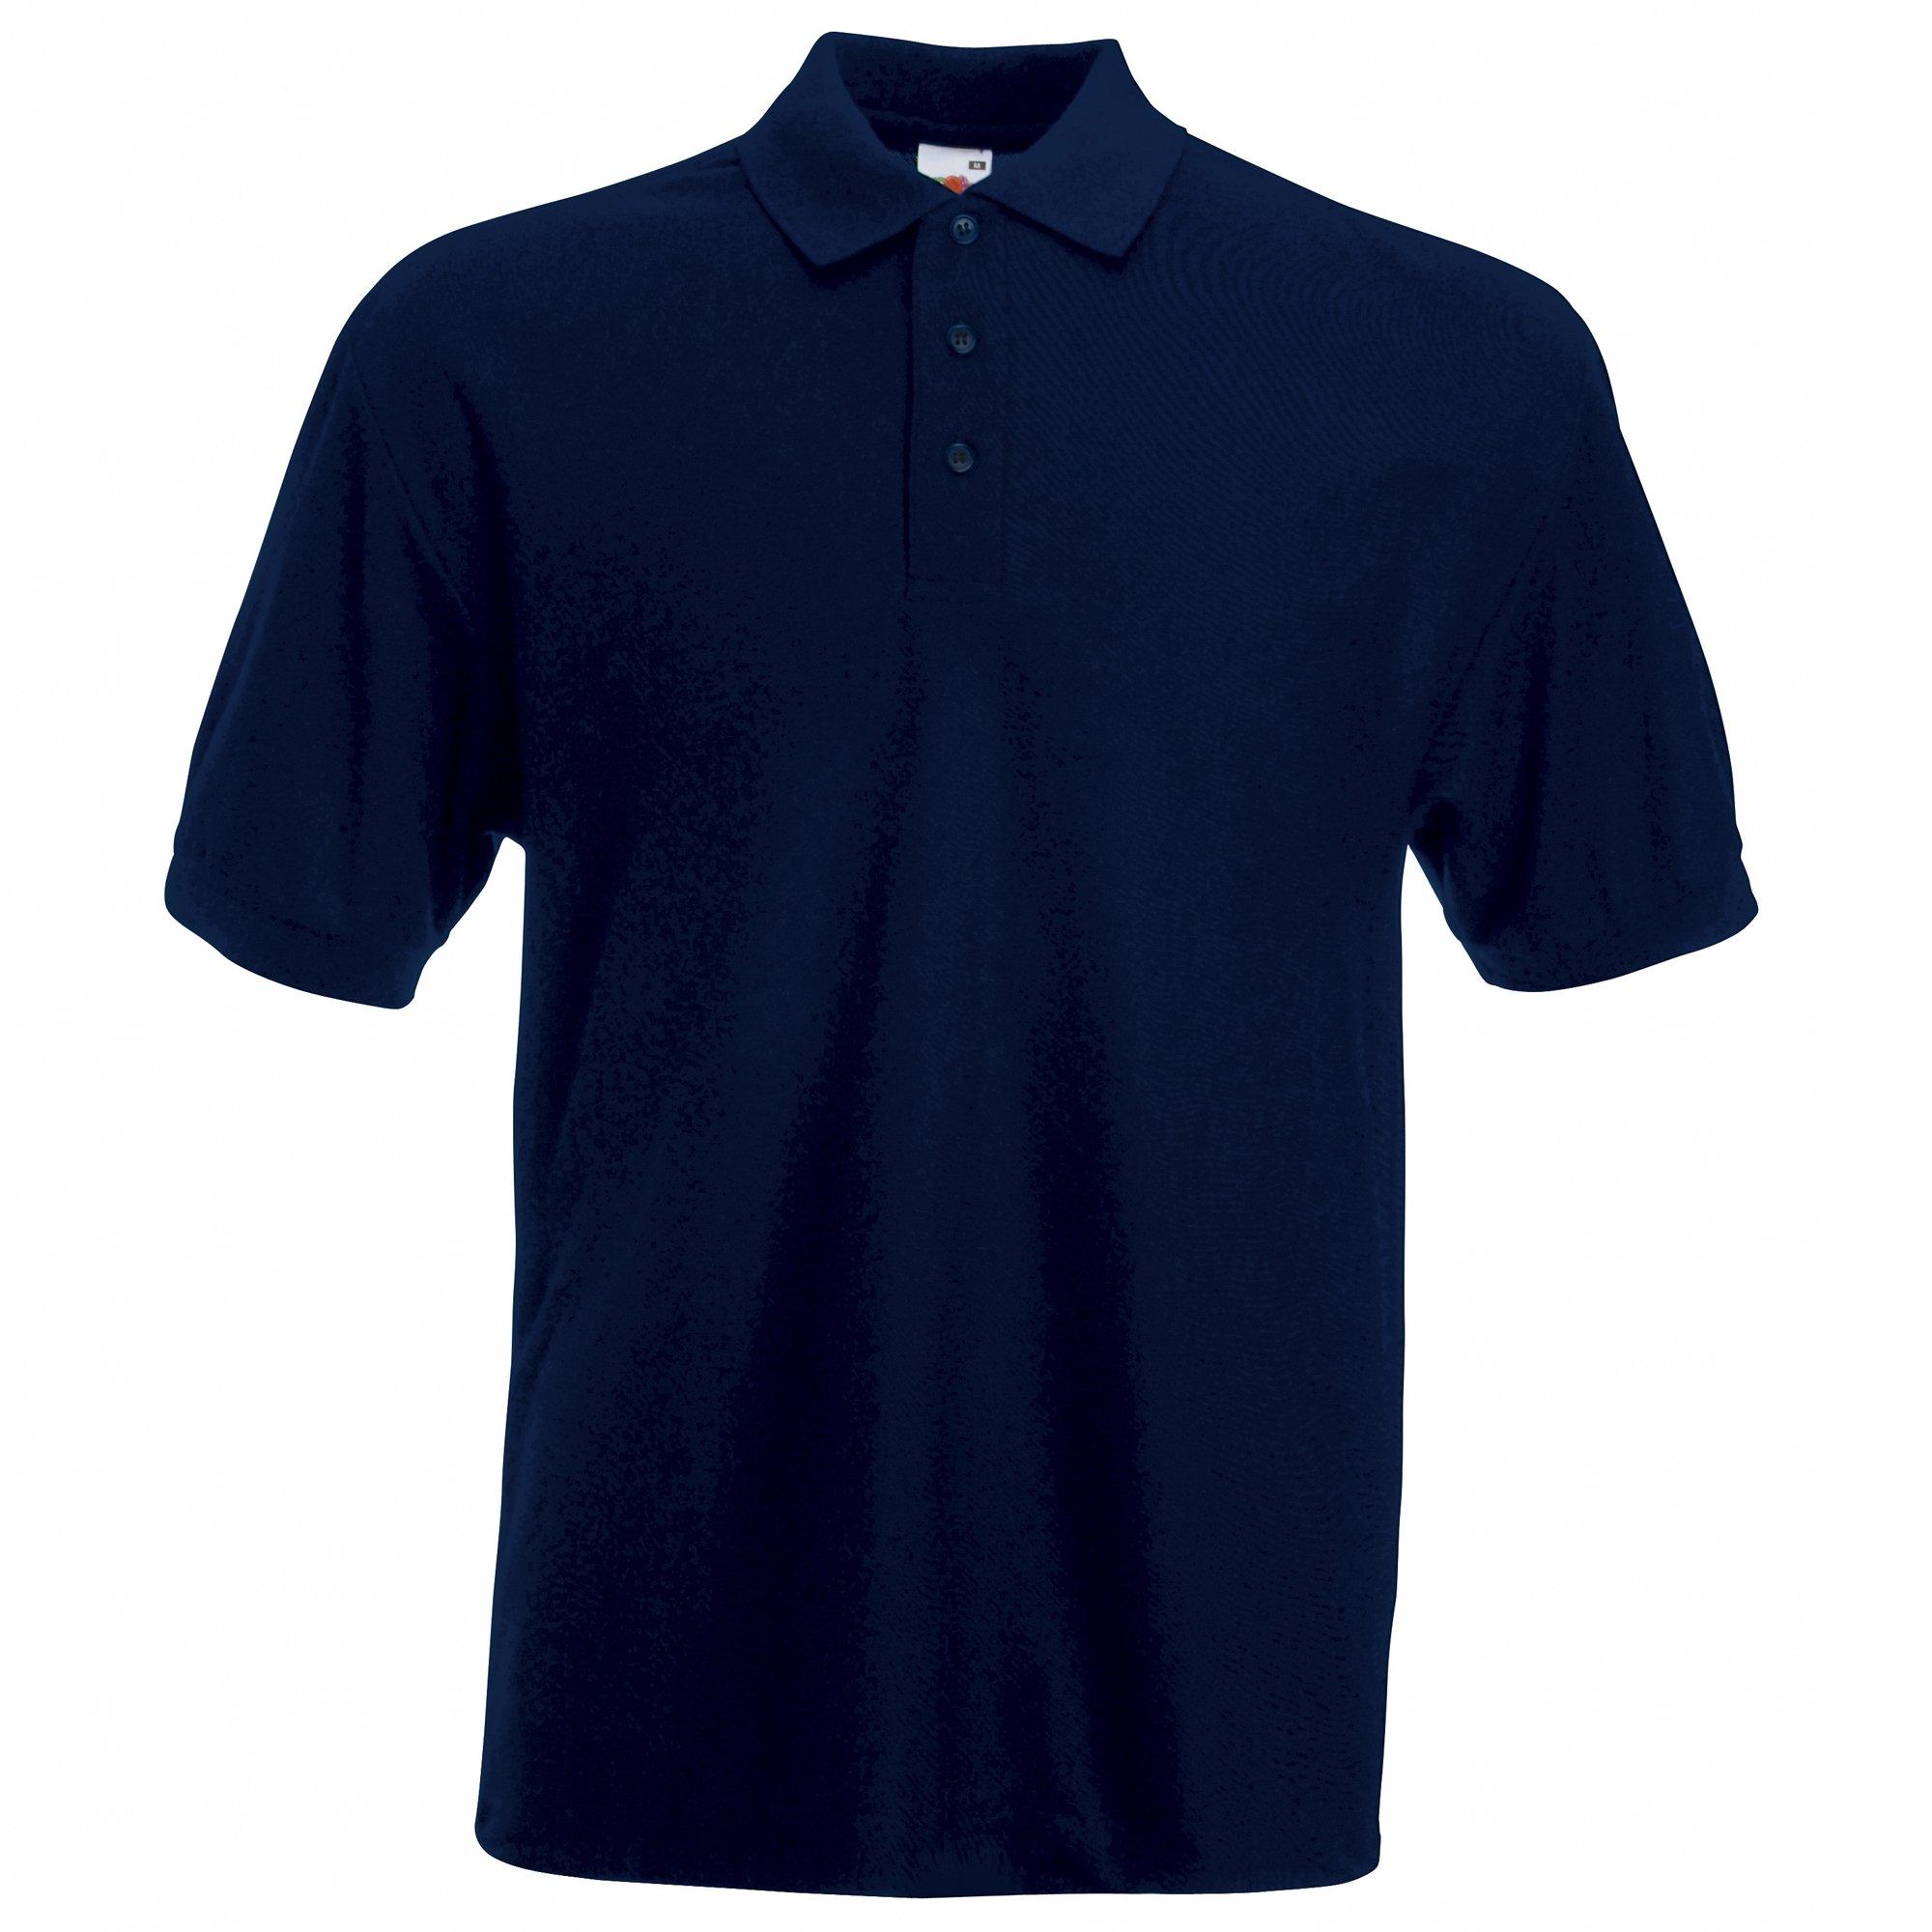 Camiseta tipo polo de manga corta para hombre Fruit of the Loom ...